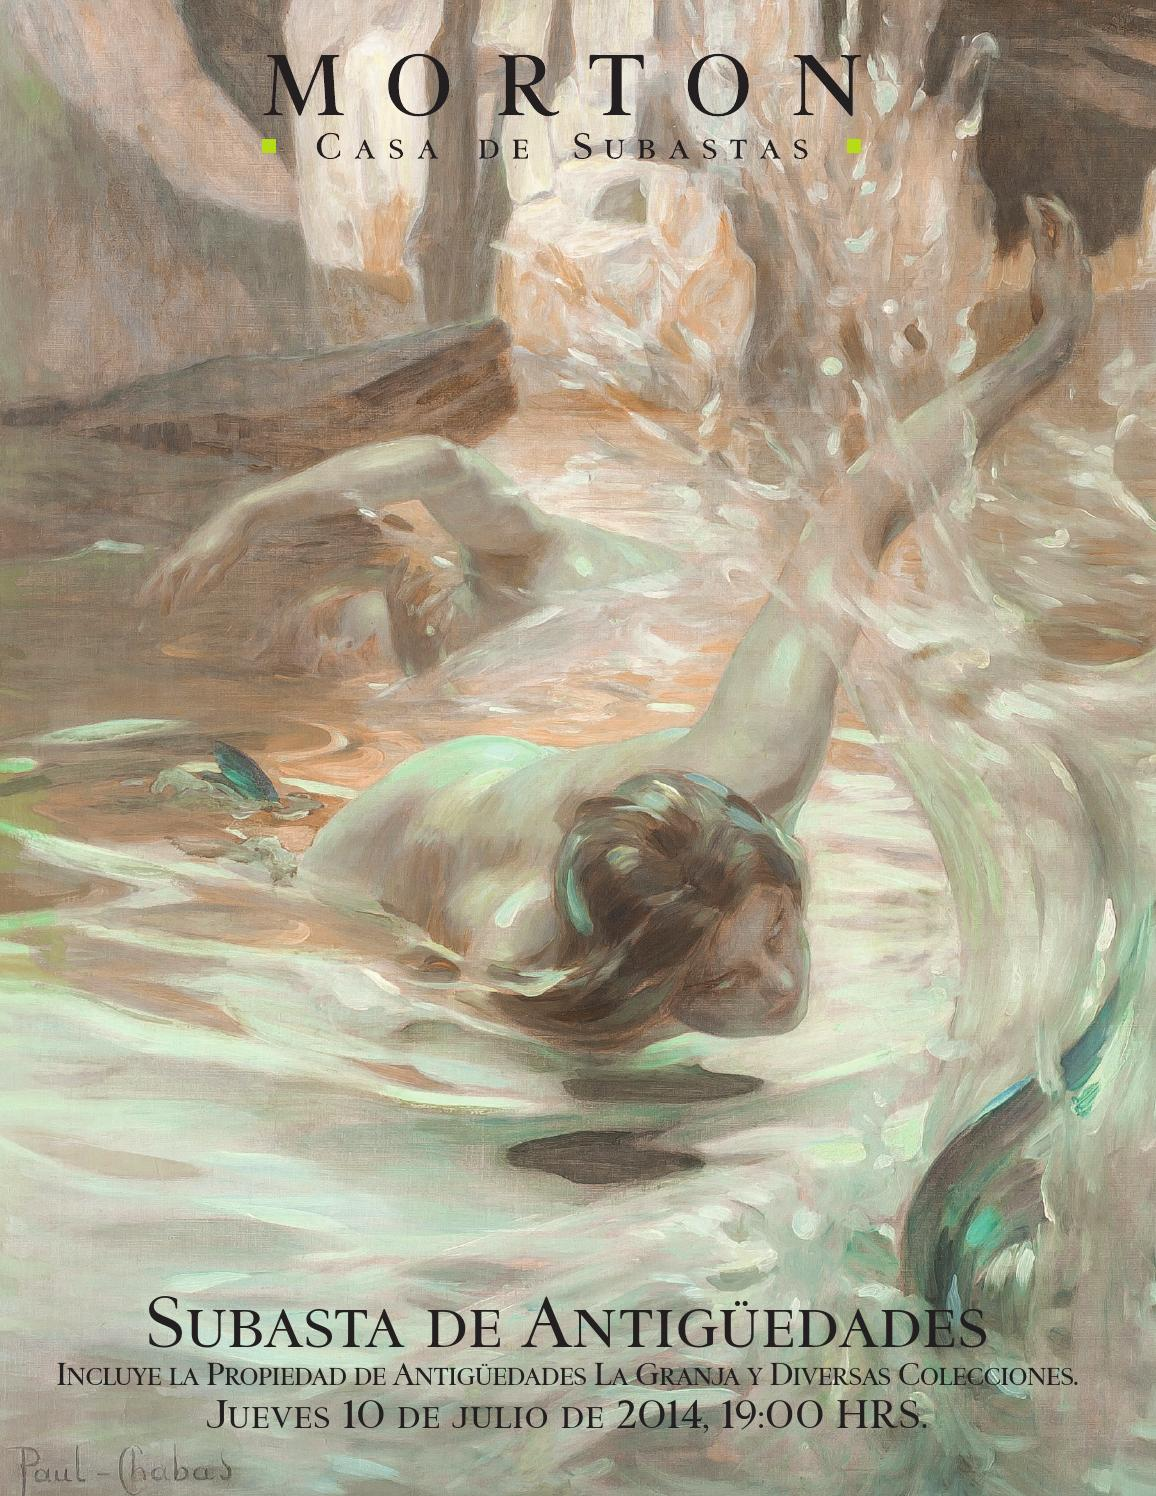 Subasta de Antigüedades by Morton Subastas - issuu